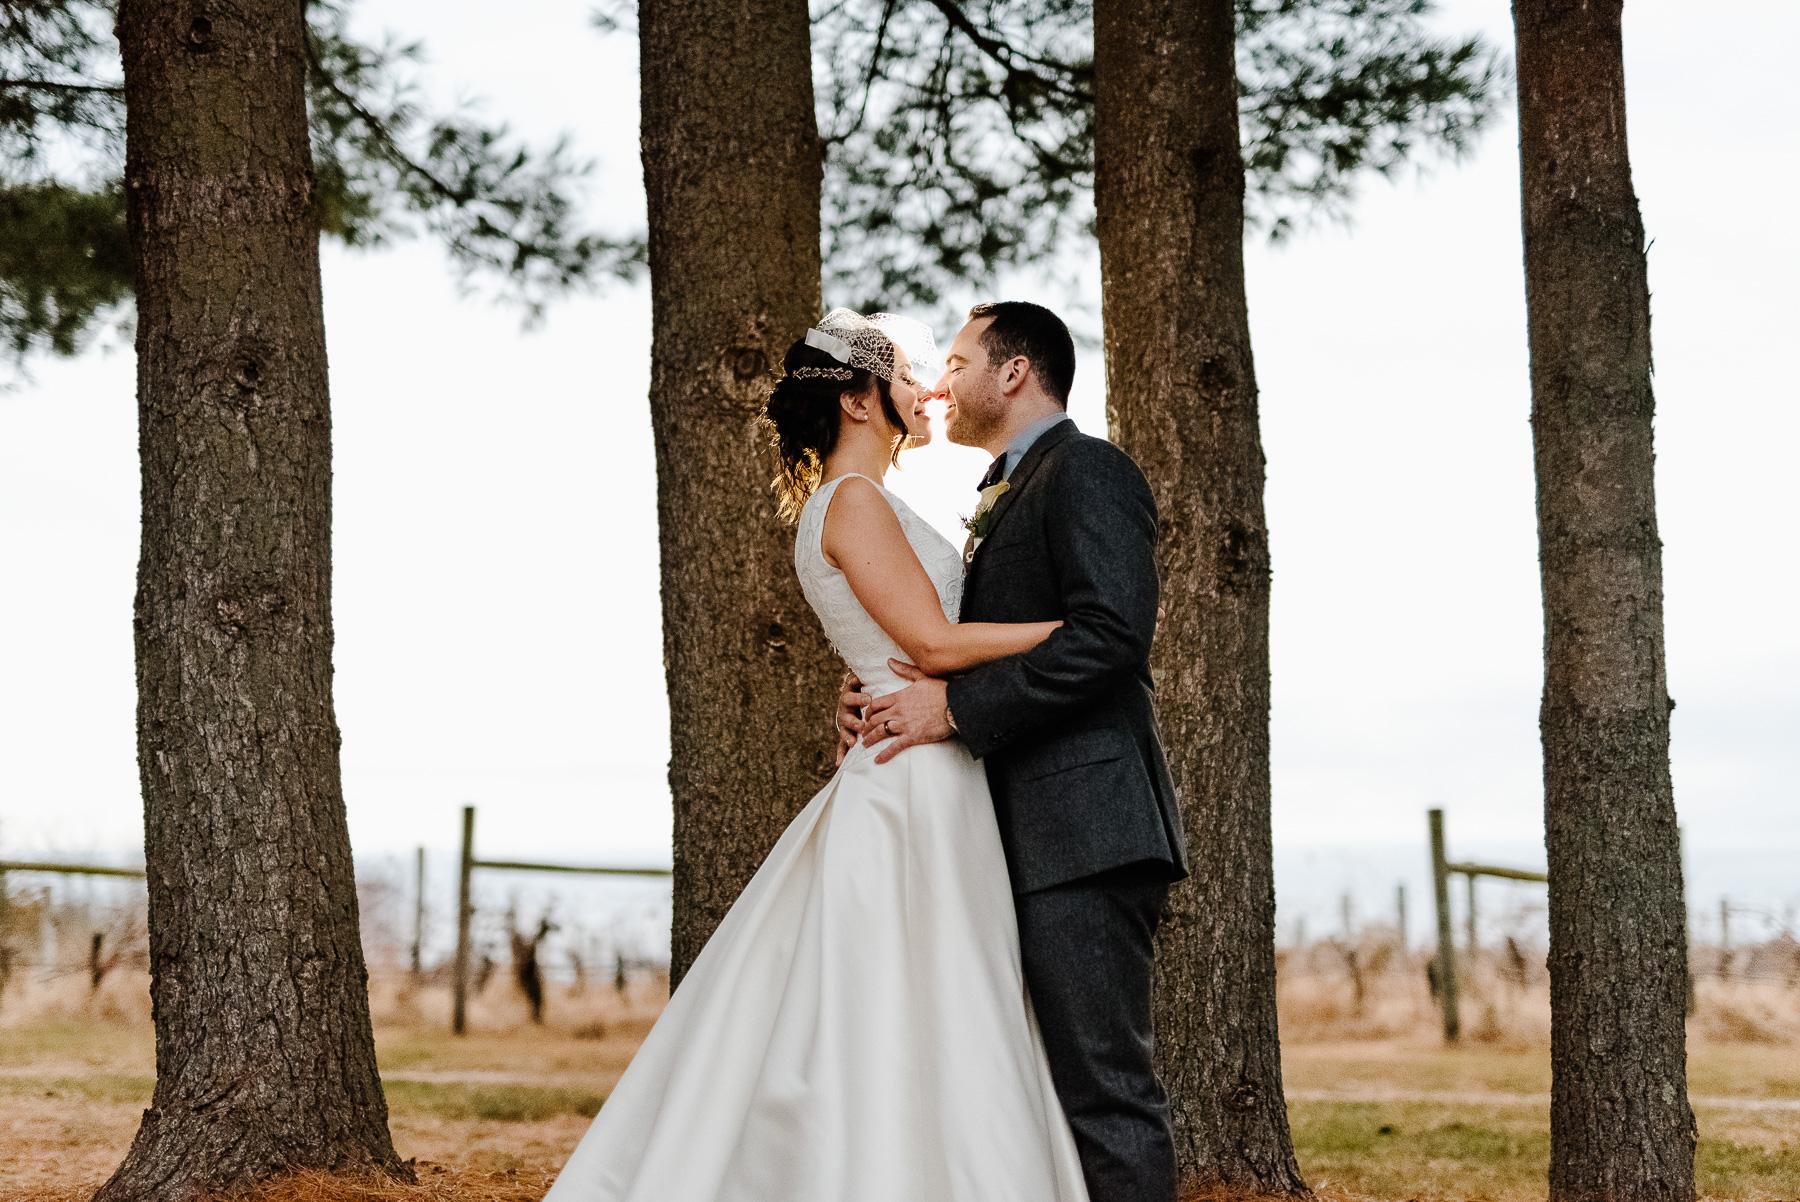 92-Laurita Winery Wedding New Jersey Wedding Photographer Laurita Winery Weddings Longbrook Photography.jpg